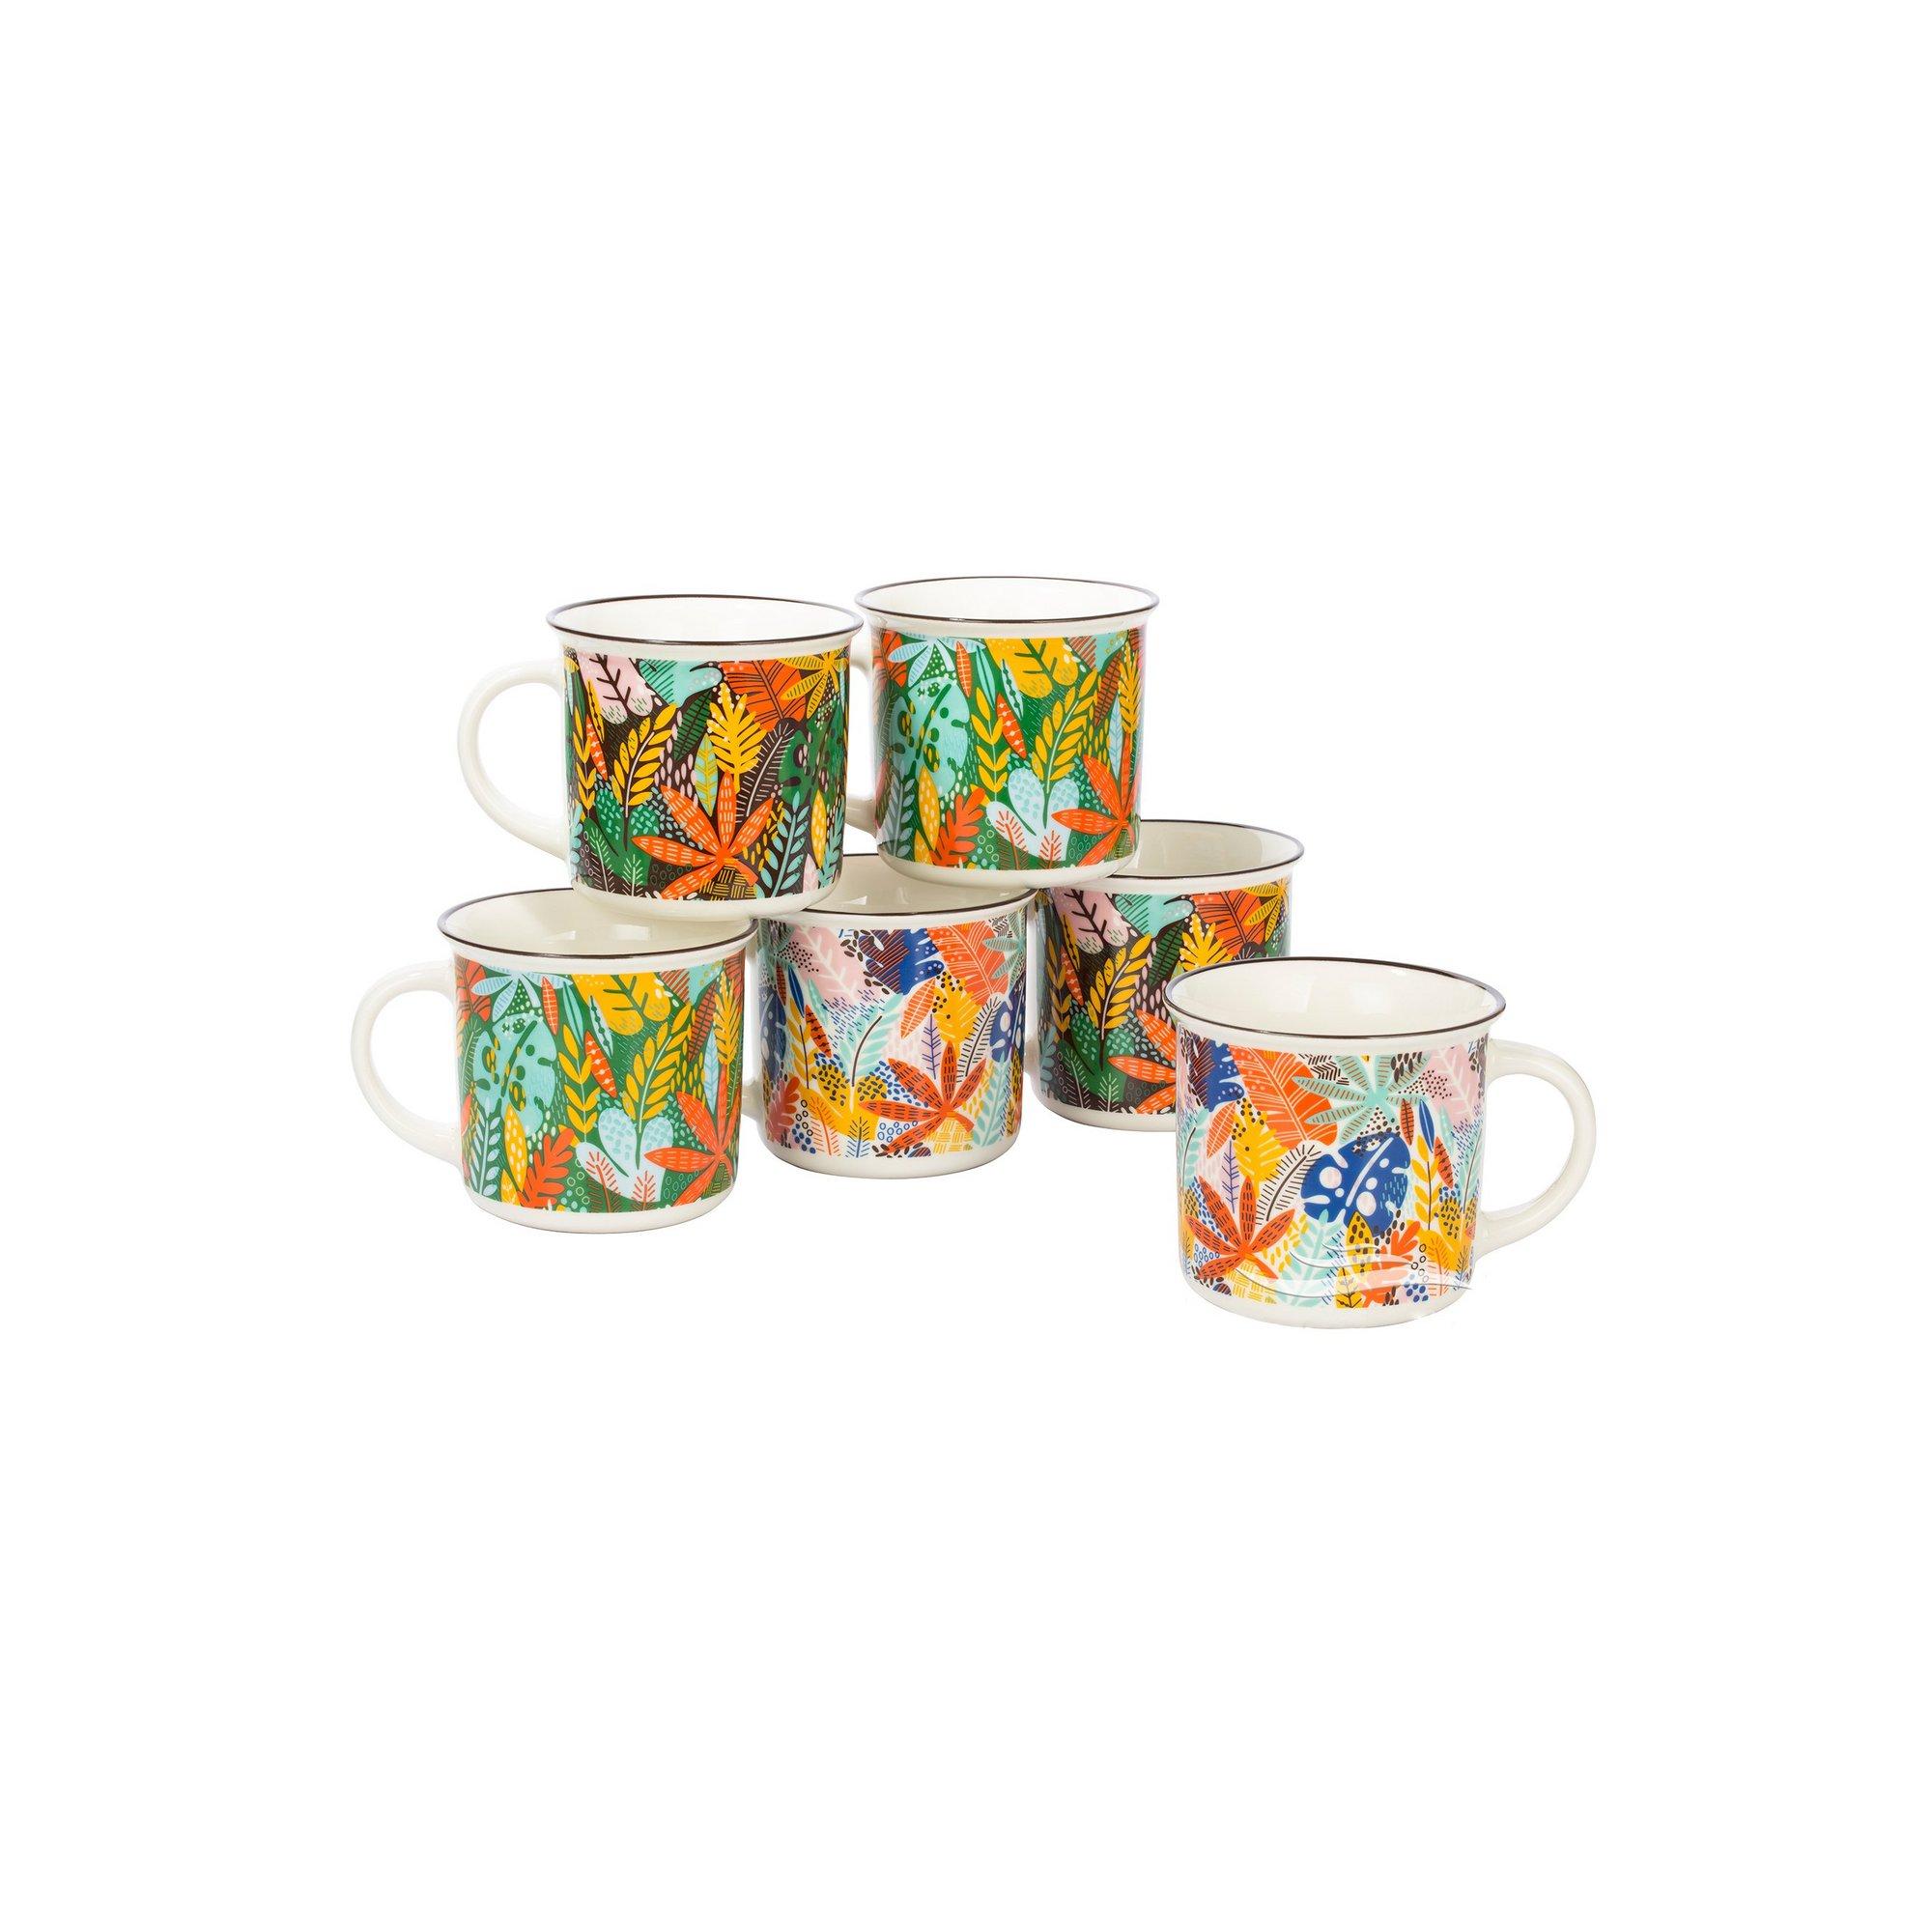 Image of 6 Piece Fine China Summer Leaf Mugs